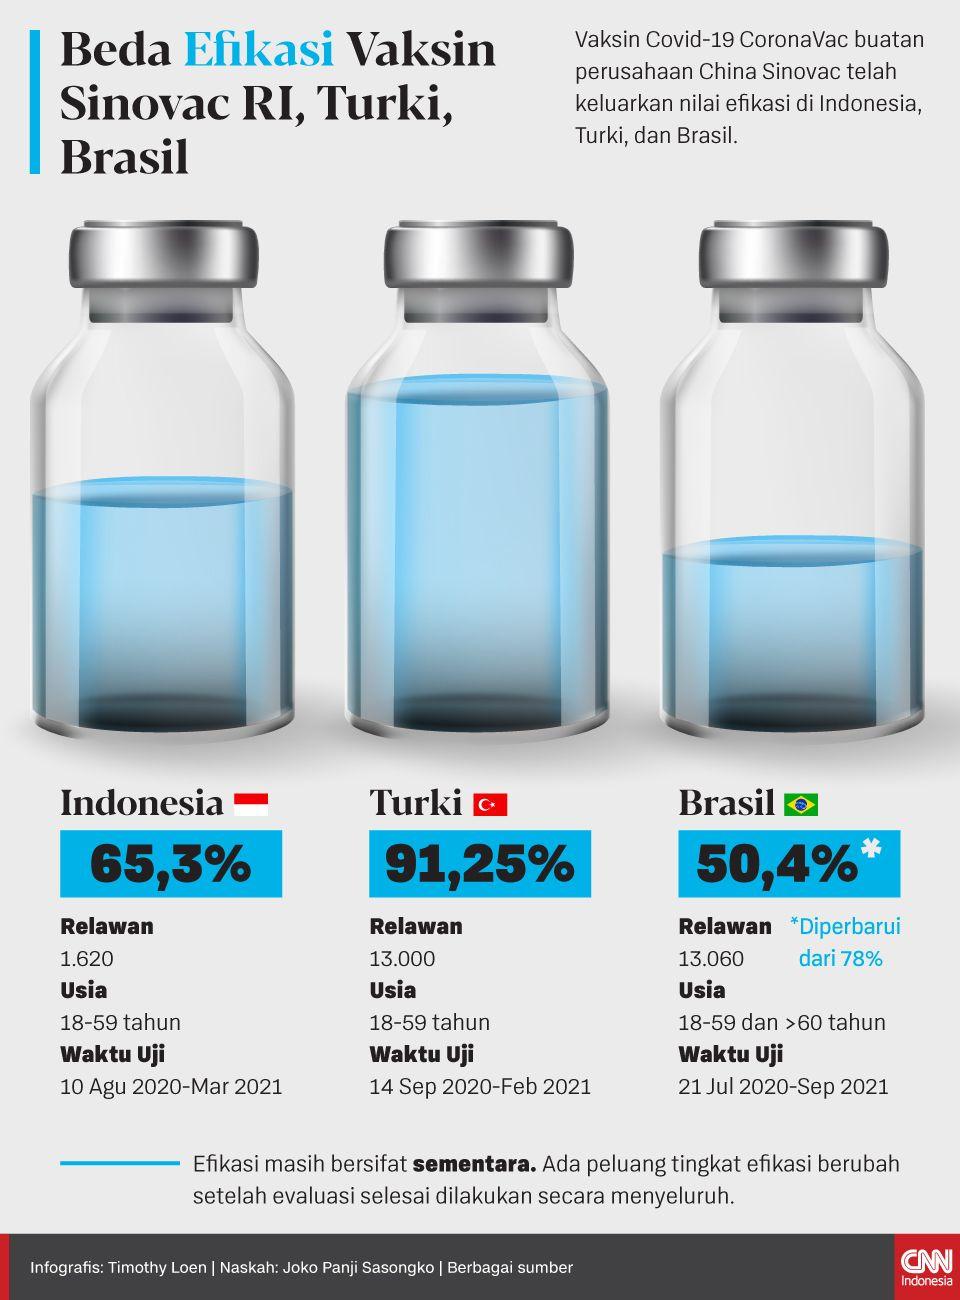 Vaksin Covid-19 CoronaVac buatan perusahaan China Sinovac telah keluarkan nilai efikasi di Indonesia, Turki, dan Brasil.